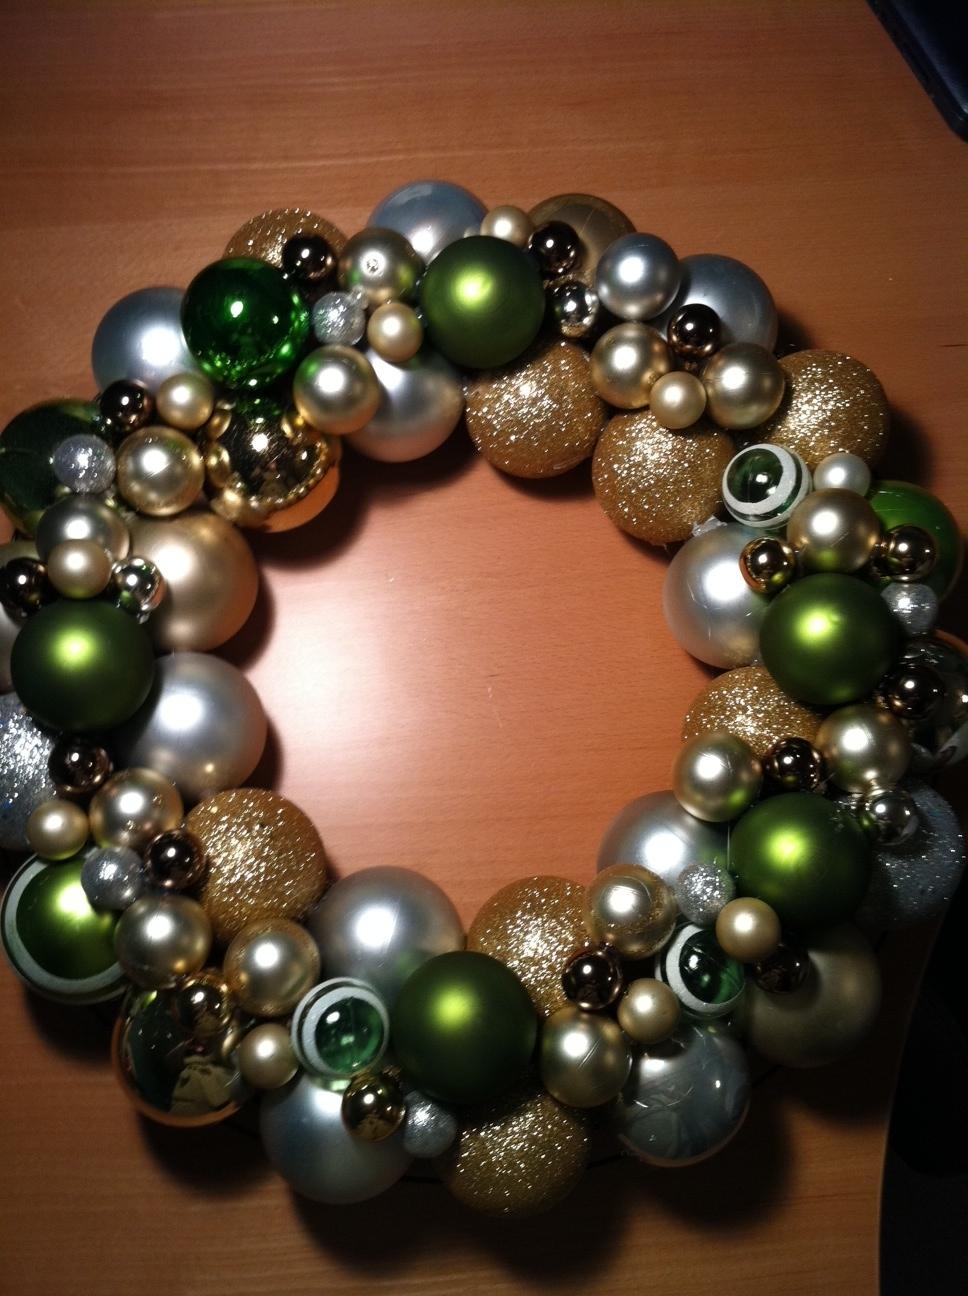 Shatterproof Christmas Ball Ornament Wreath by Jessica ...  |Christmas Ball Wreath